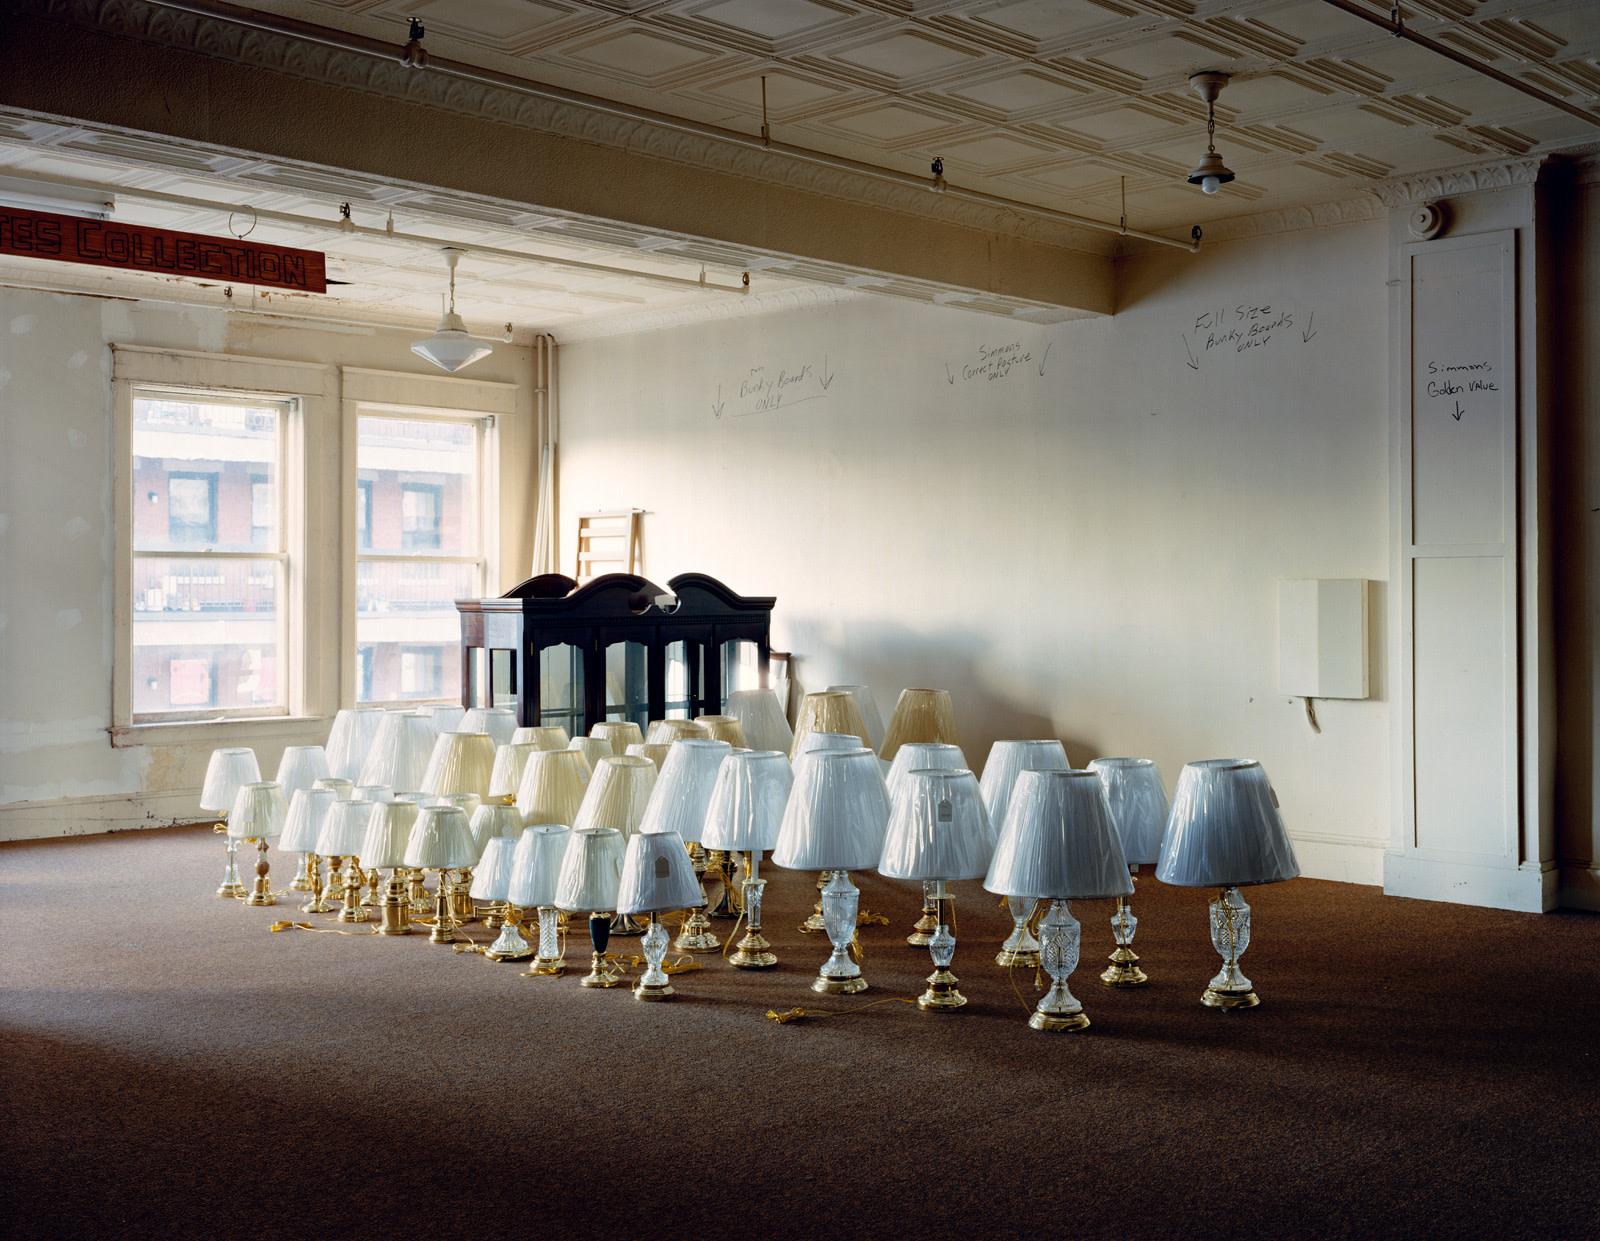 Warehouse, 2000